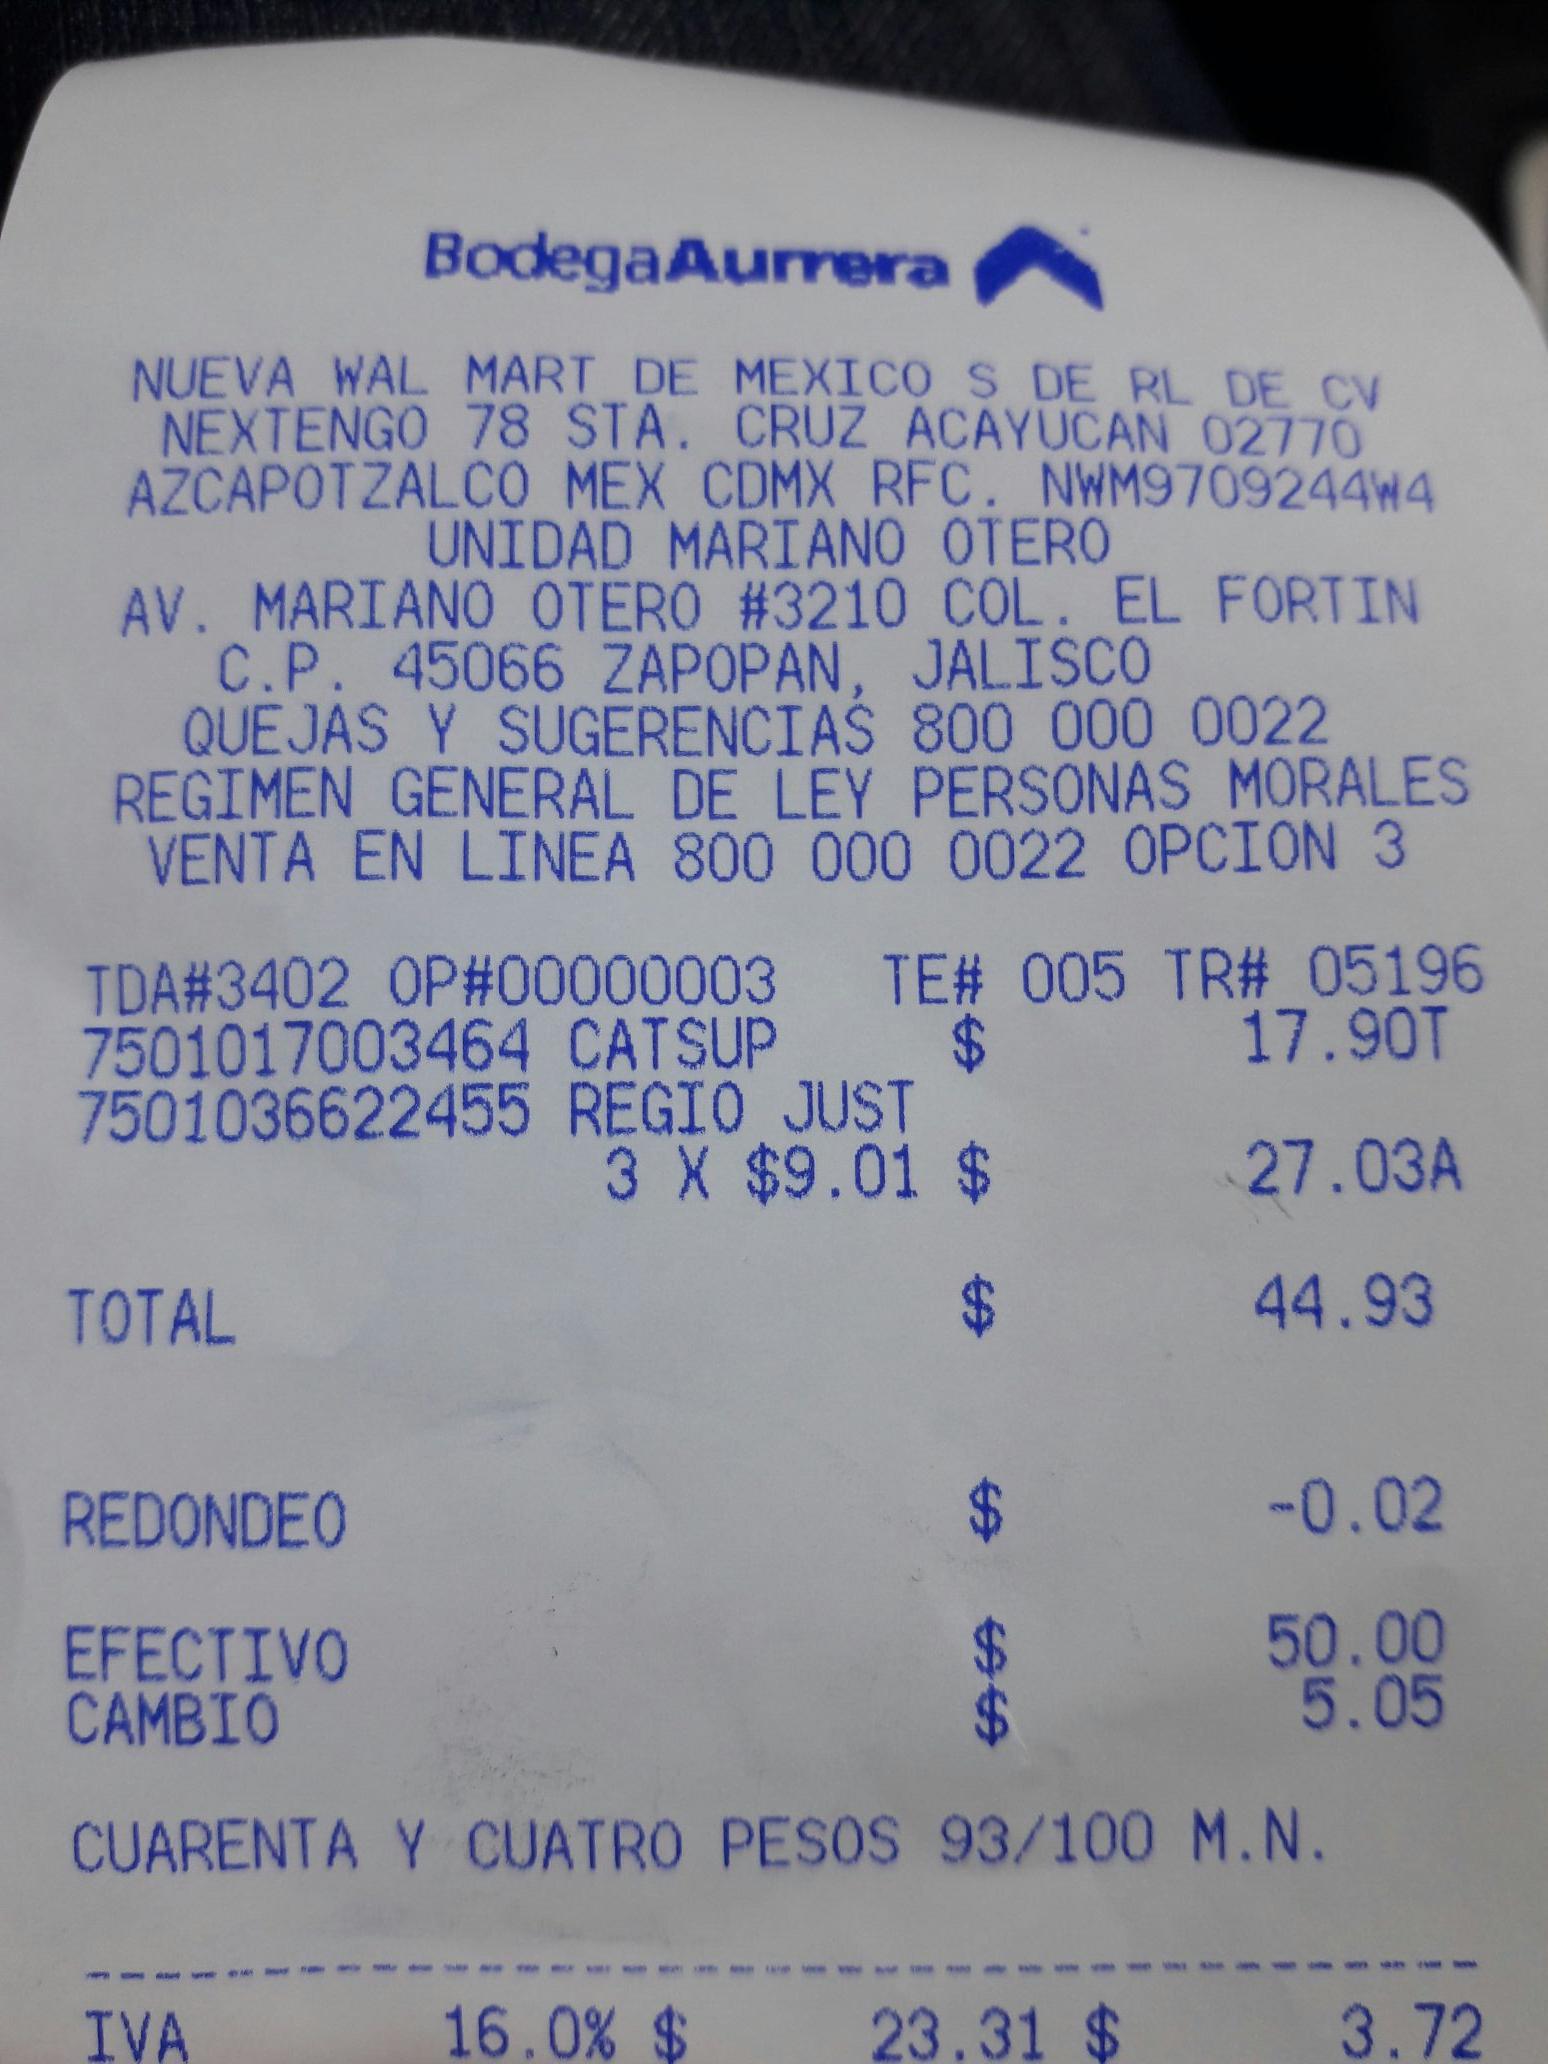 "Bodega Aurrera: Papel higiénico ""Regio Just-1"" 6 Rollos por $9.01"